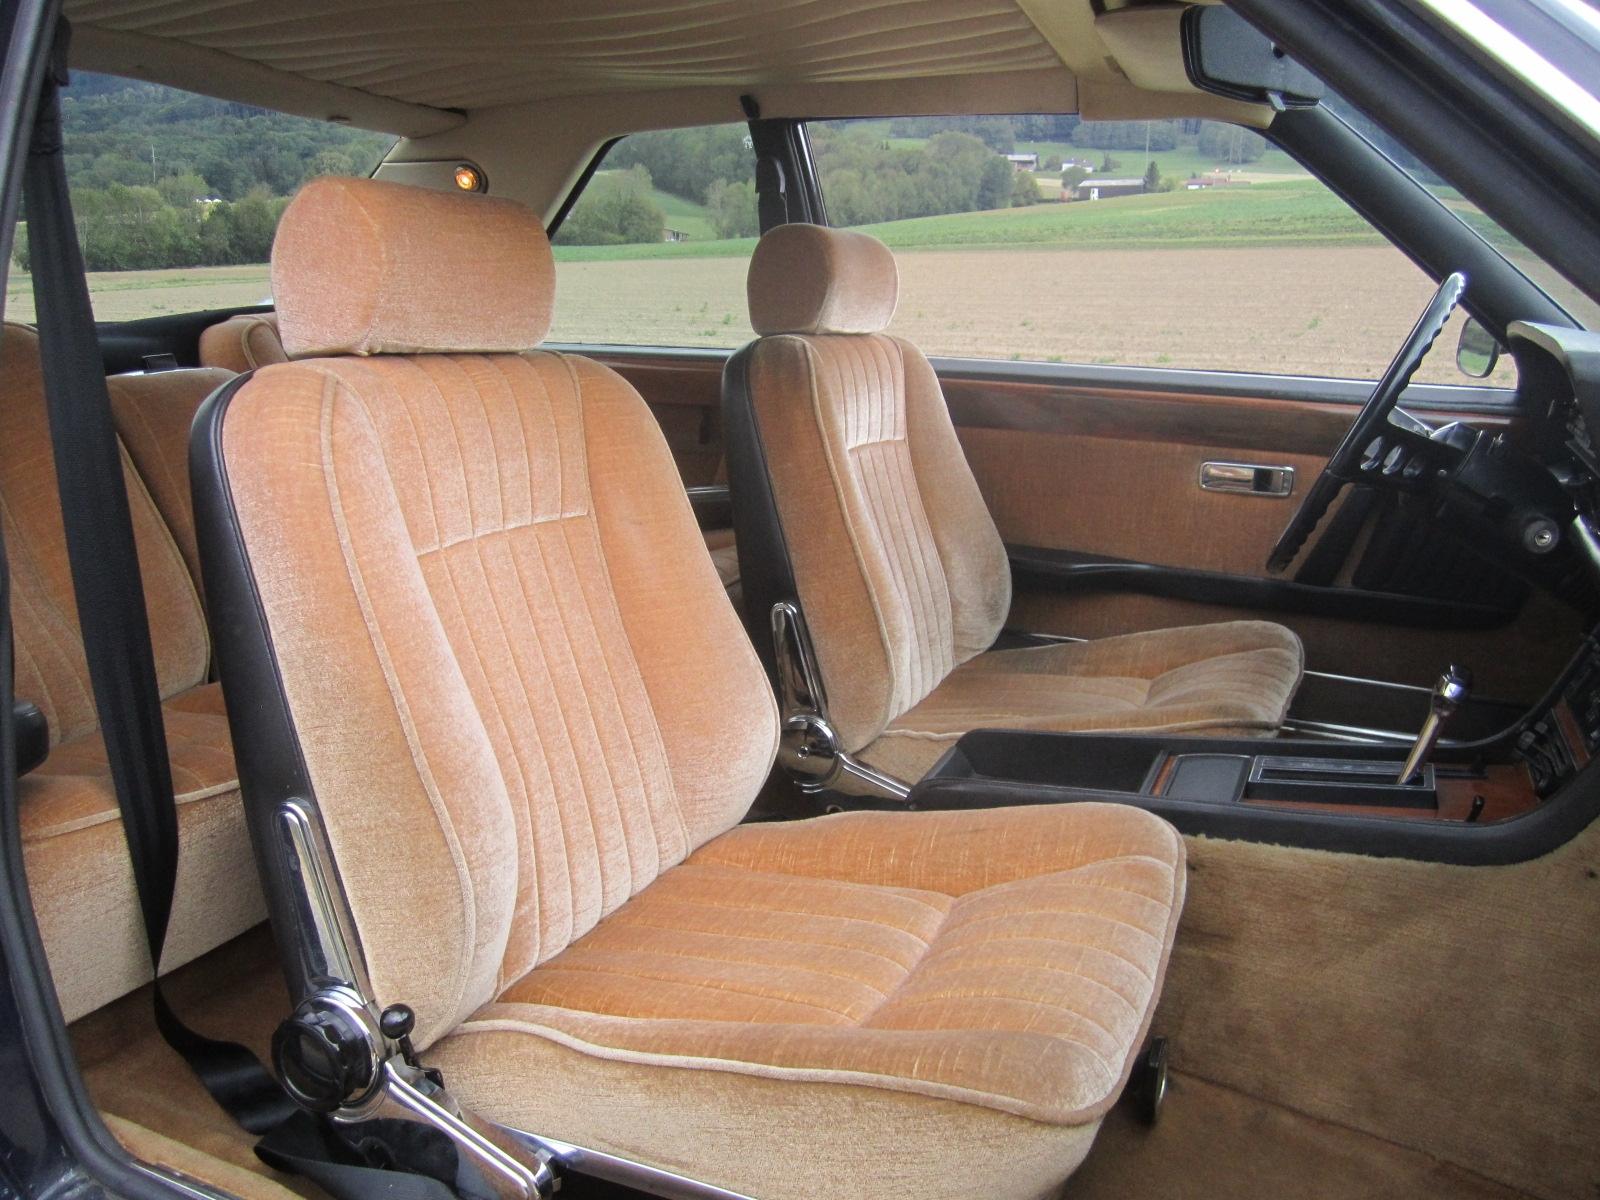 Fiat Coupe Innen Vorne